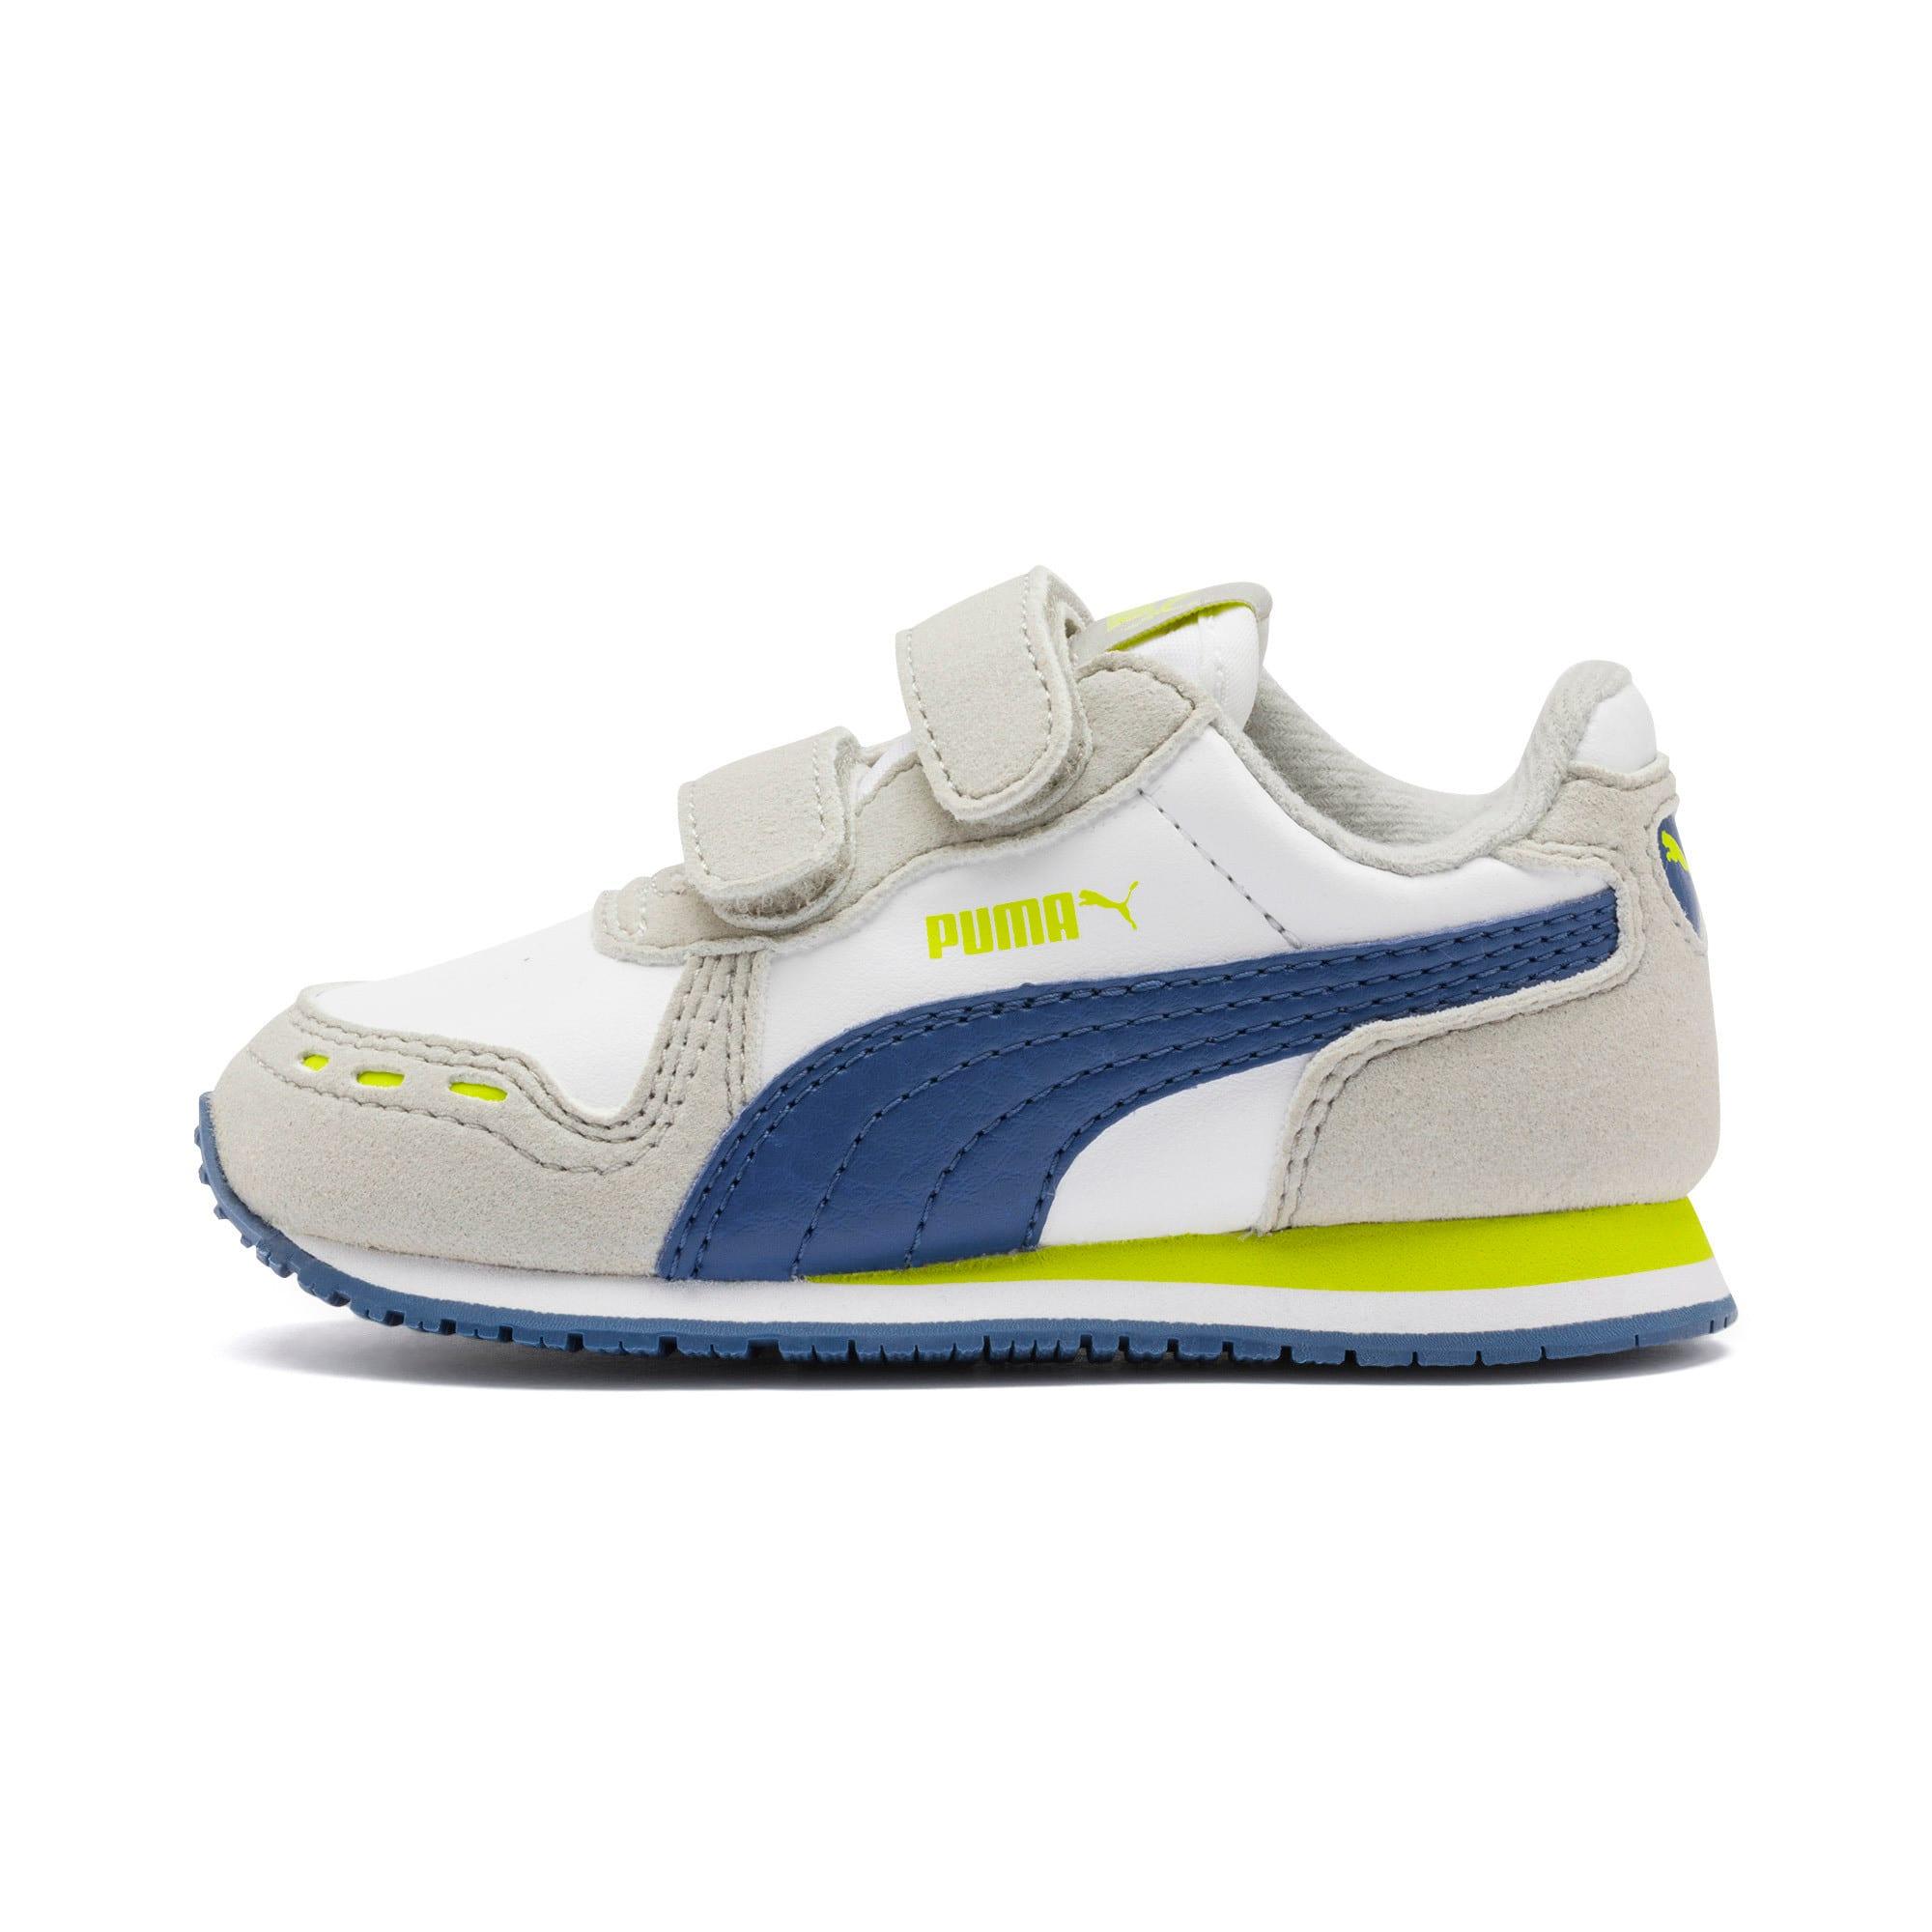 Thumbnail 1 of Cabana Racer SL Toddler Shoes, Puma White-Galaxy Blue, medium